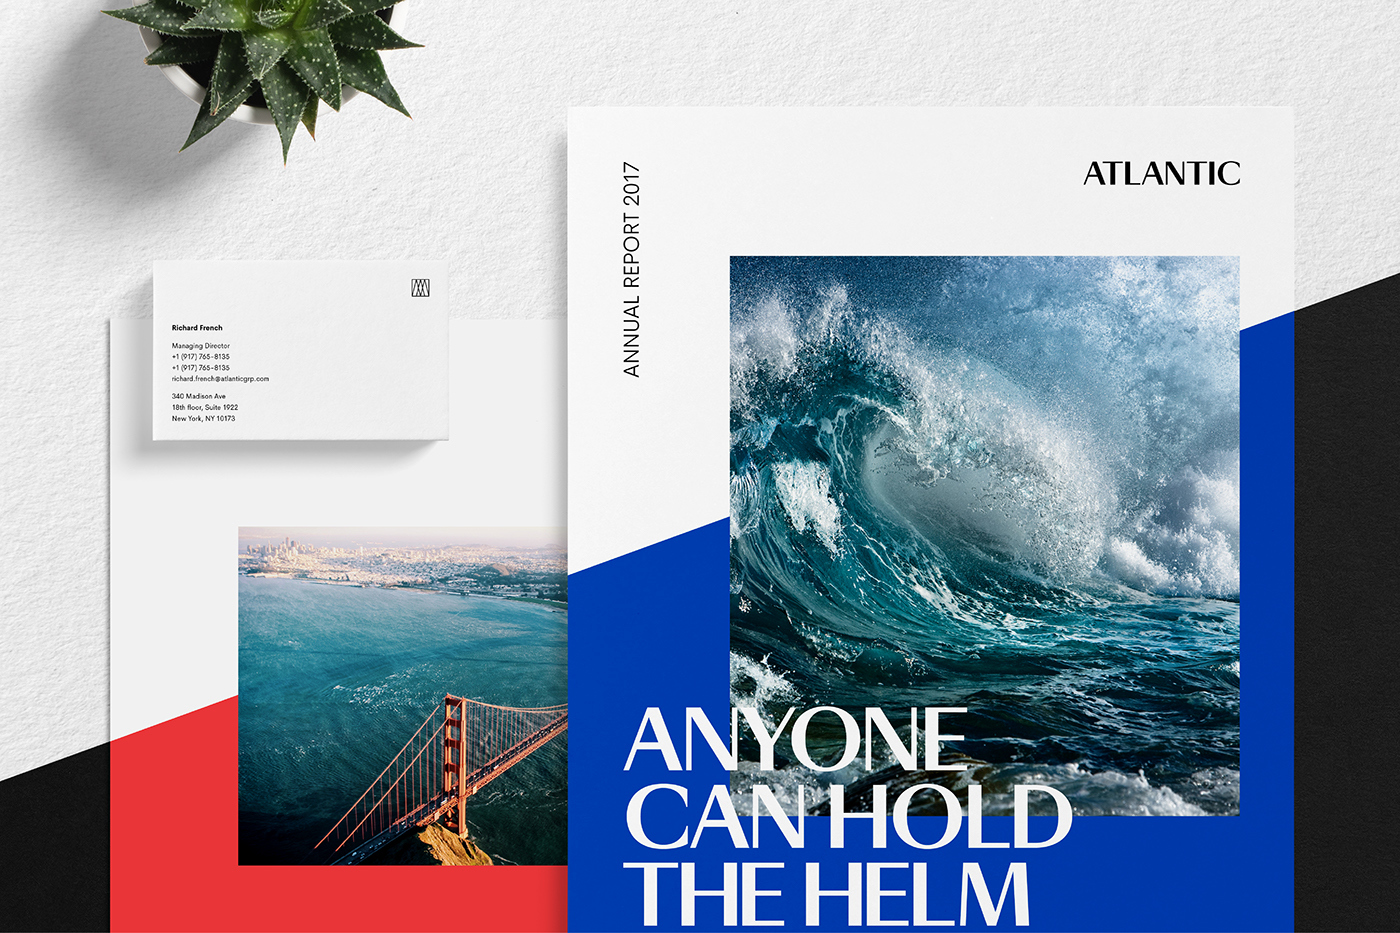 Atlantic品牌设计 欣赏-第1张